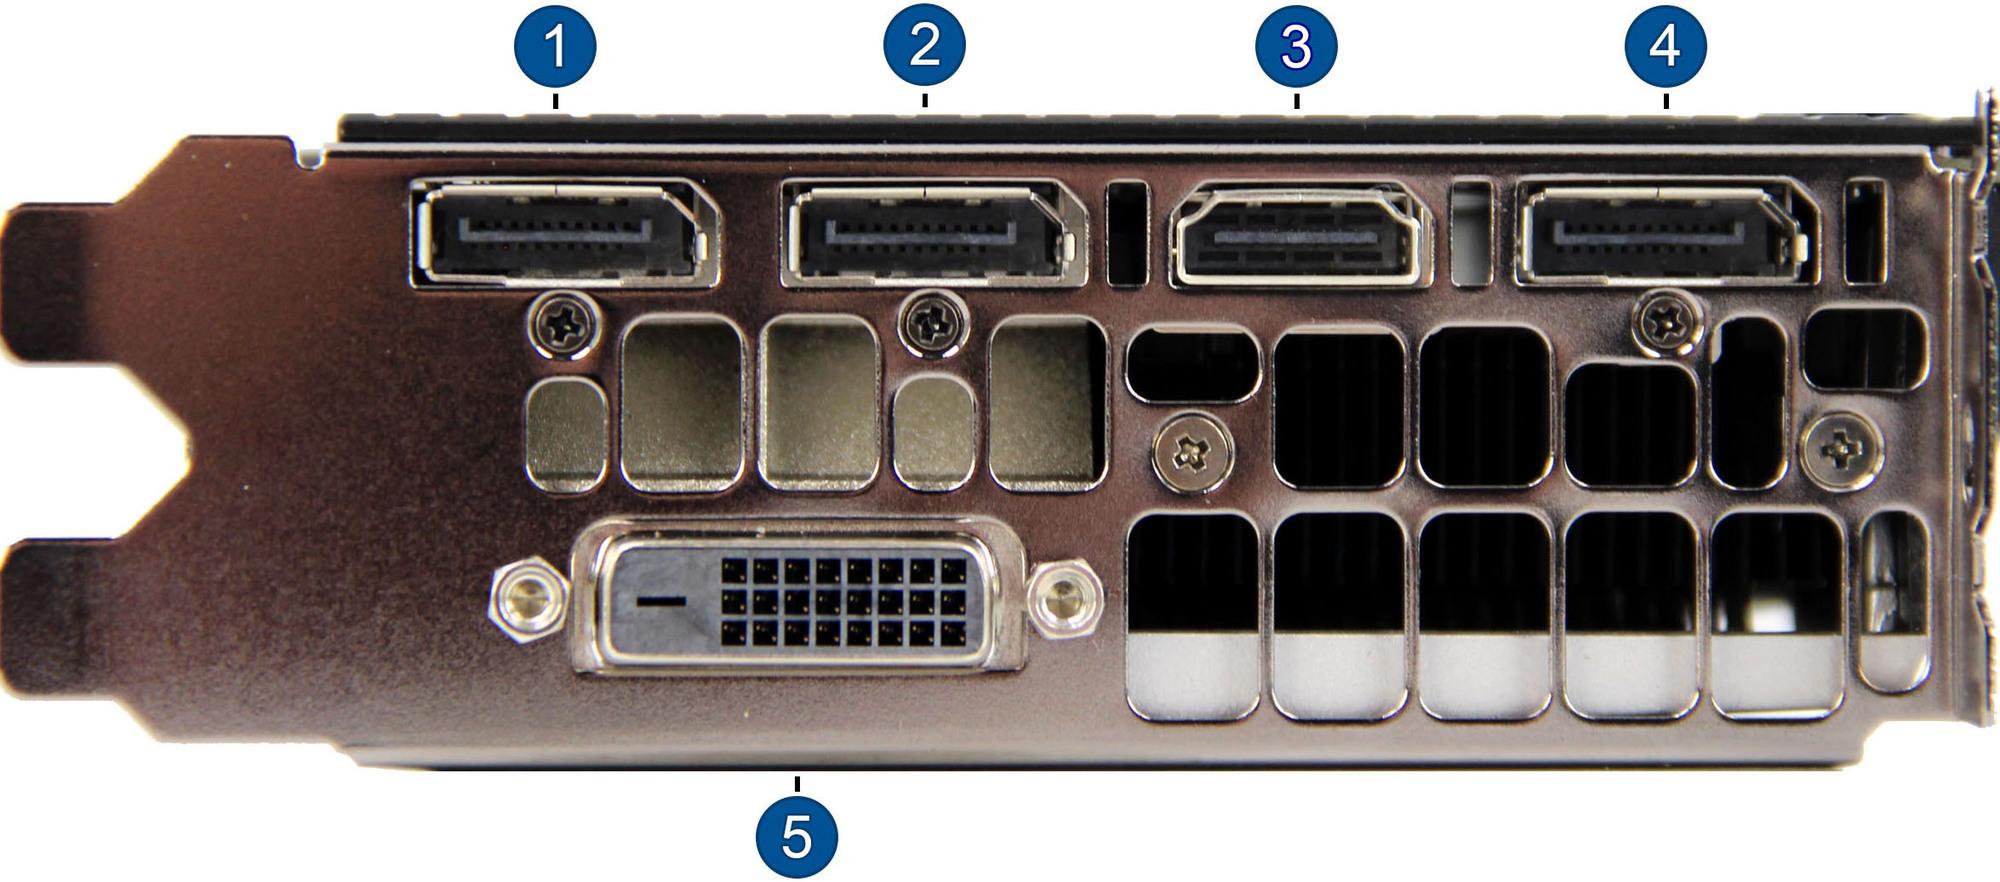 Configure PC w/ NVIDIA GeForce GTX 1070 8GB Video Card